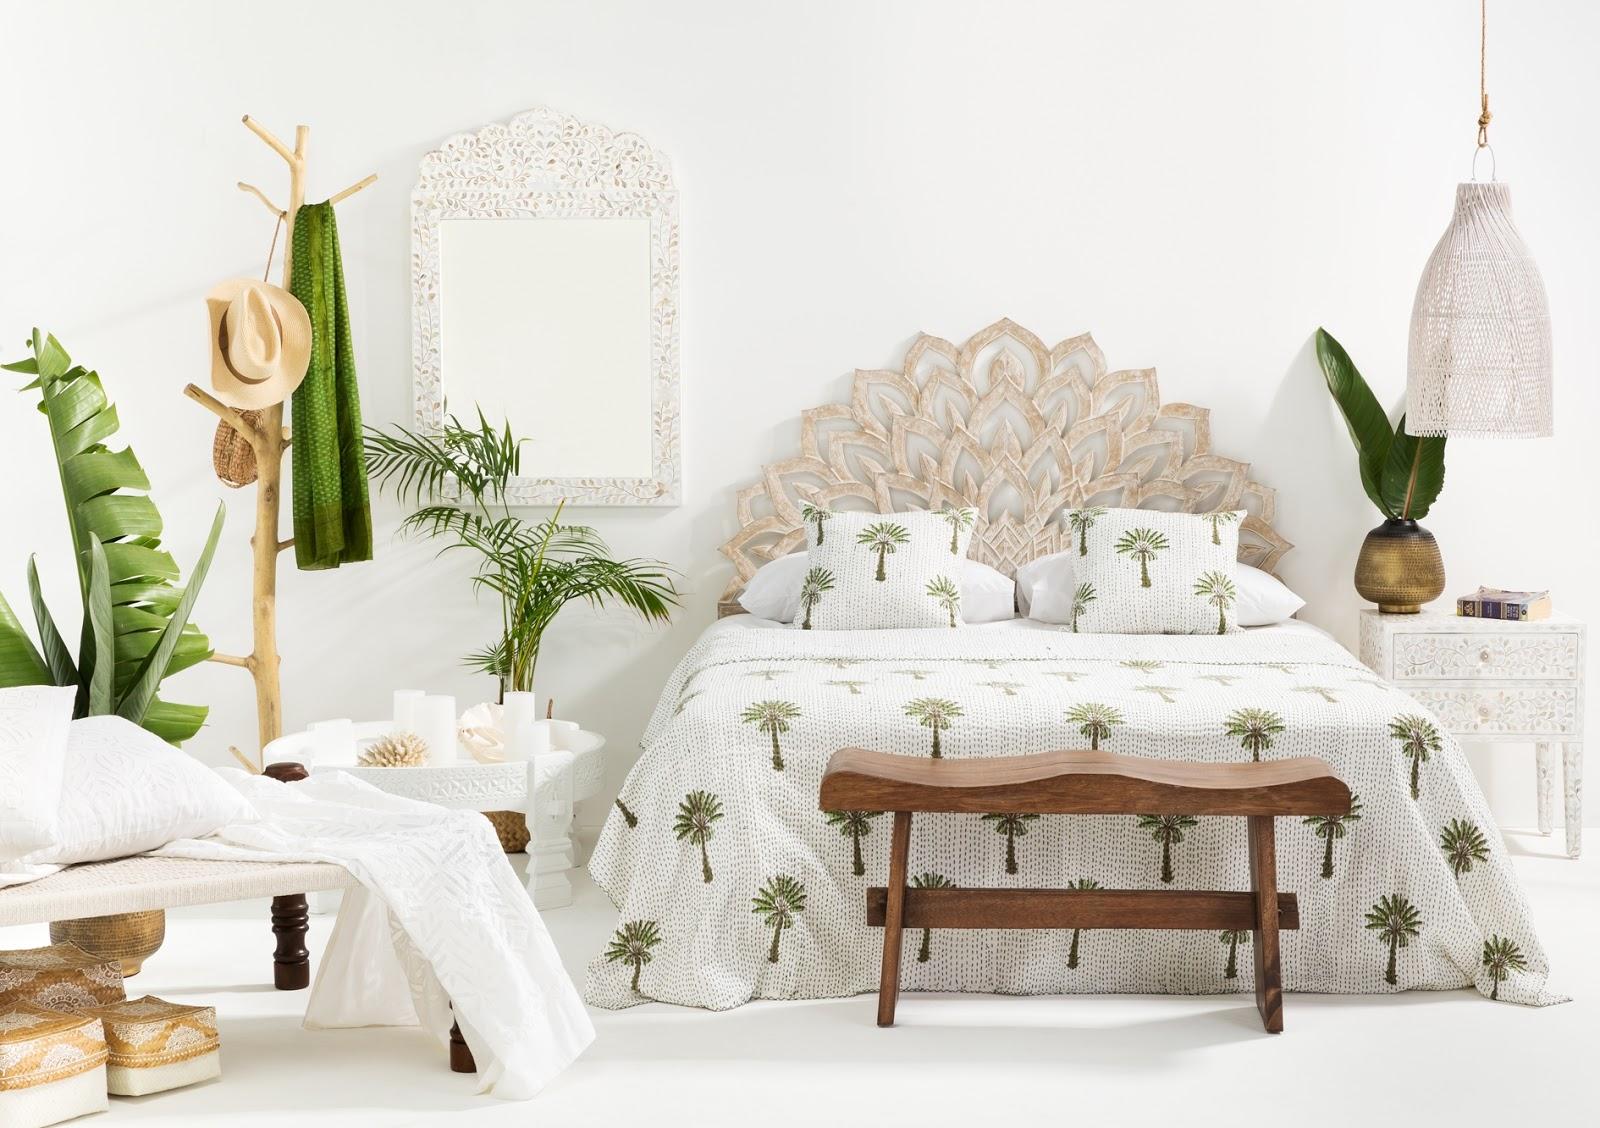 Tropical Bedroom Inspiration